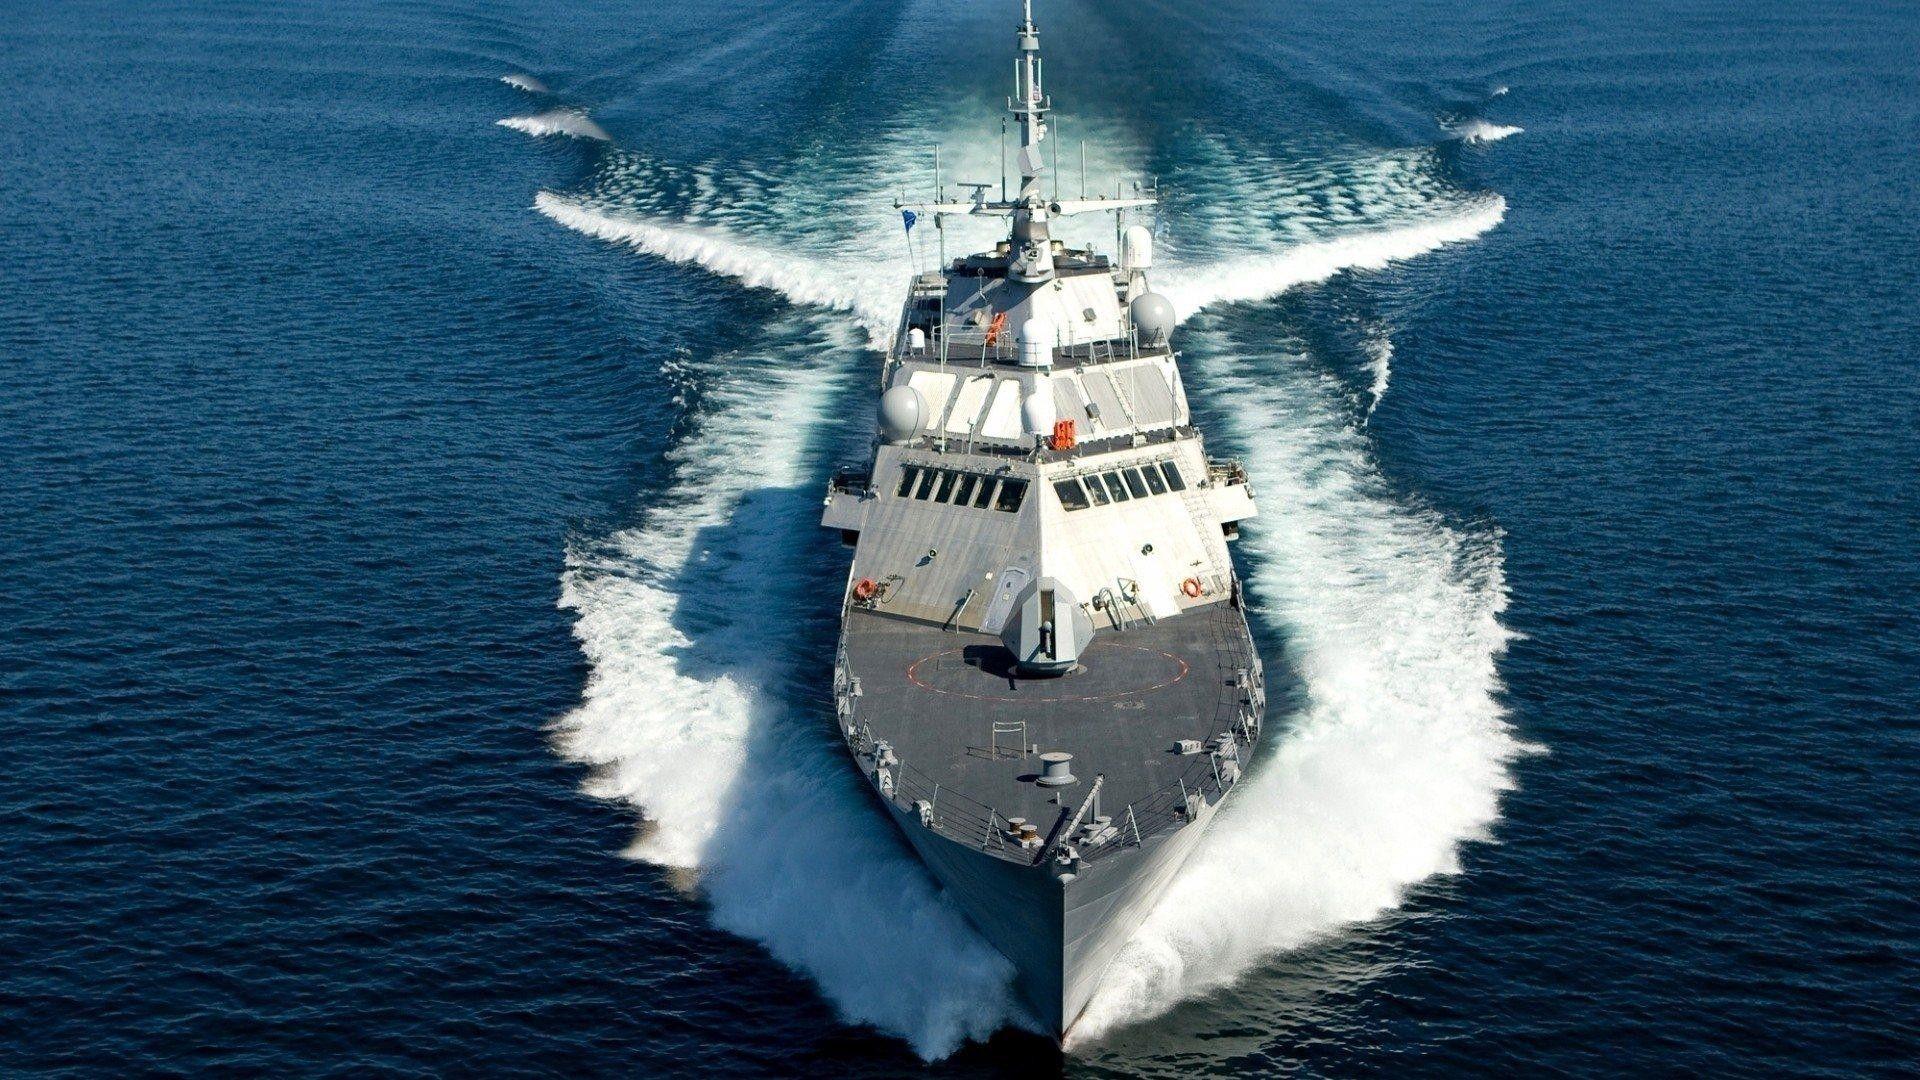 Navy Ships Wallpaper Https Wallpapersko Com Navy Ships Wallpaper Html Ships Wallpaper Hd Wallpapers Download In 2020 Indian Navy Ships Navy Day Indian Navy